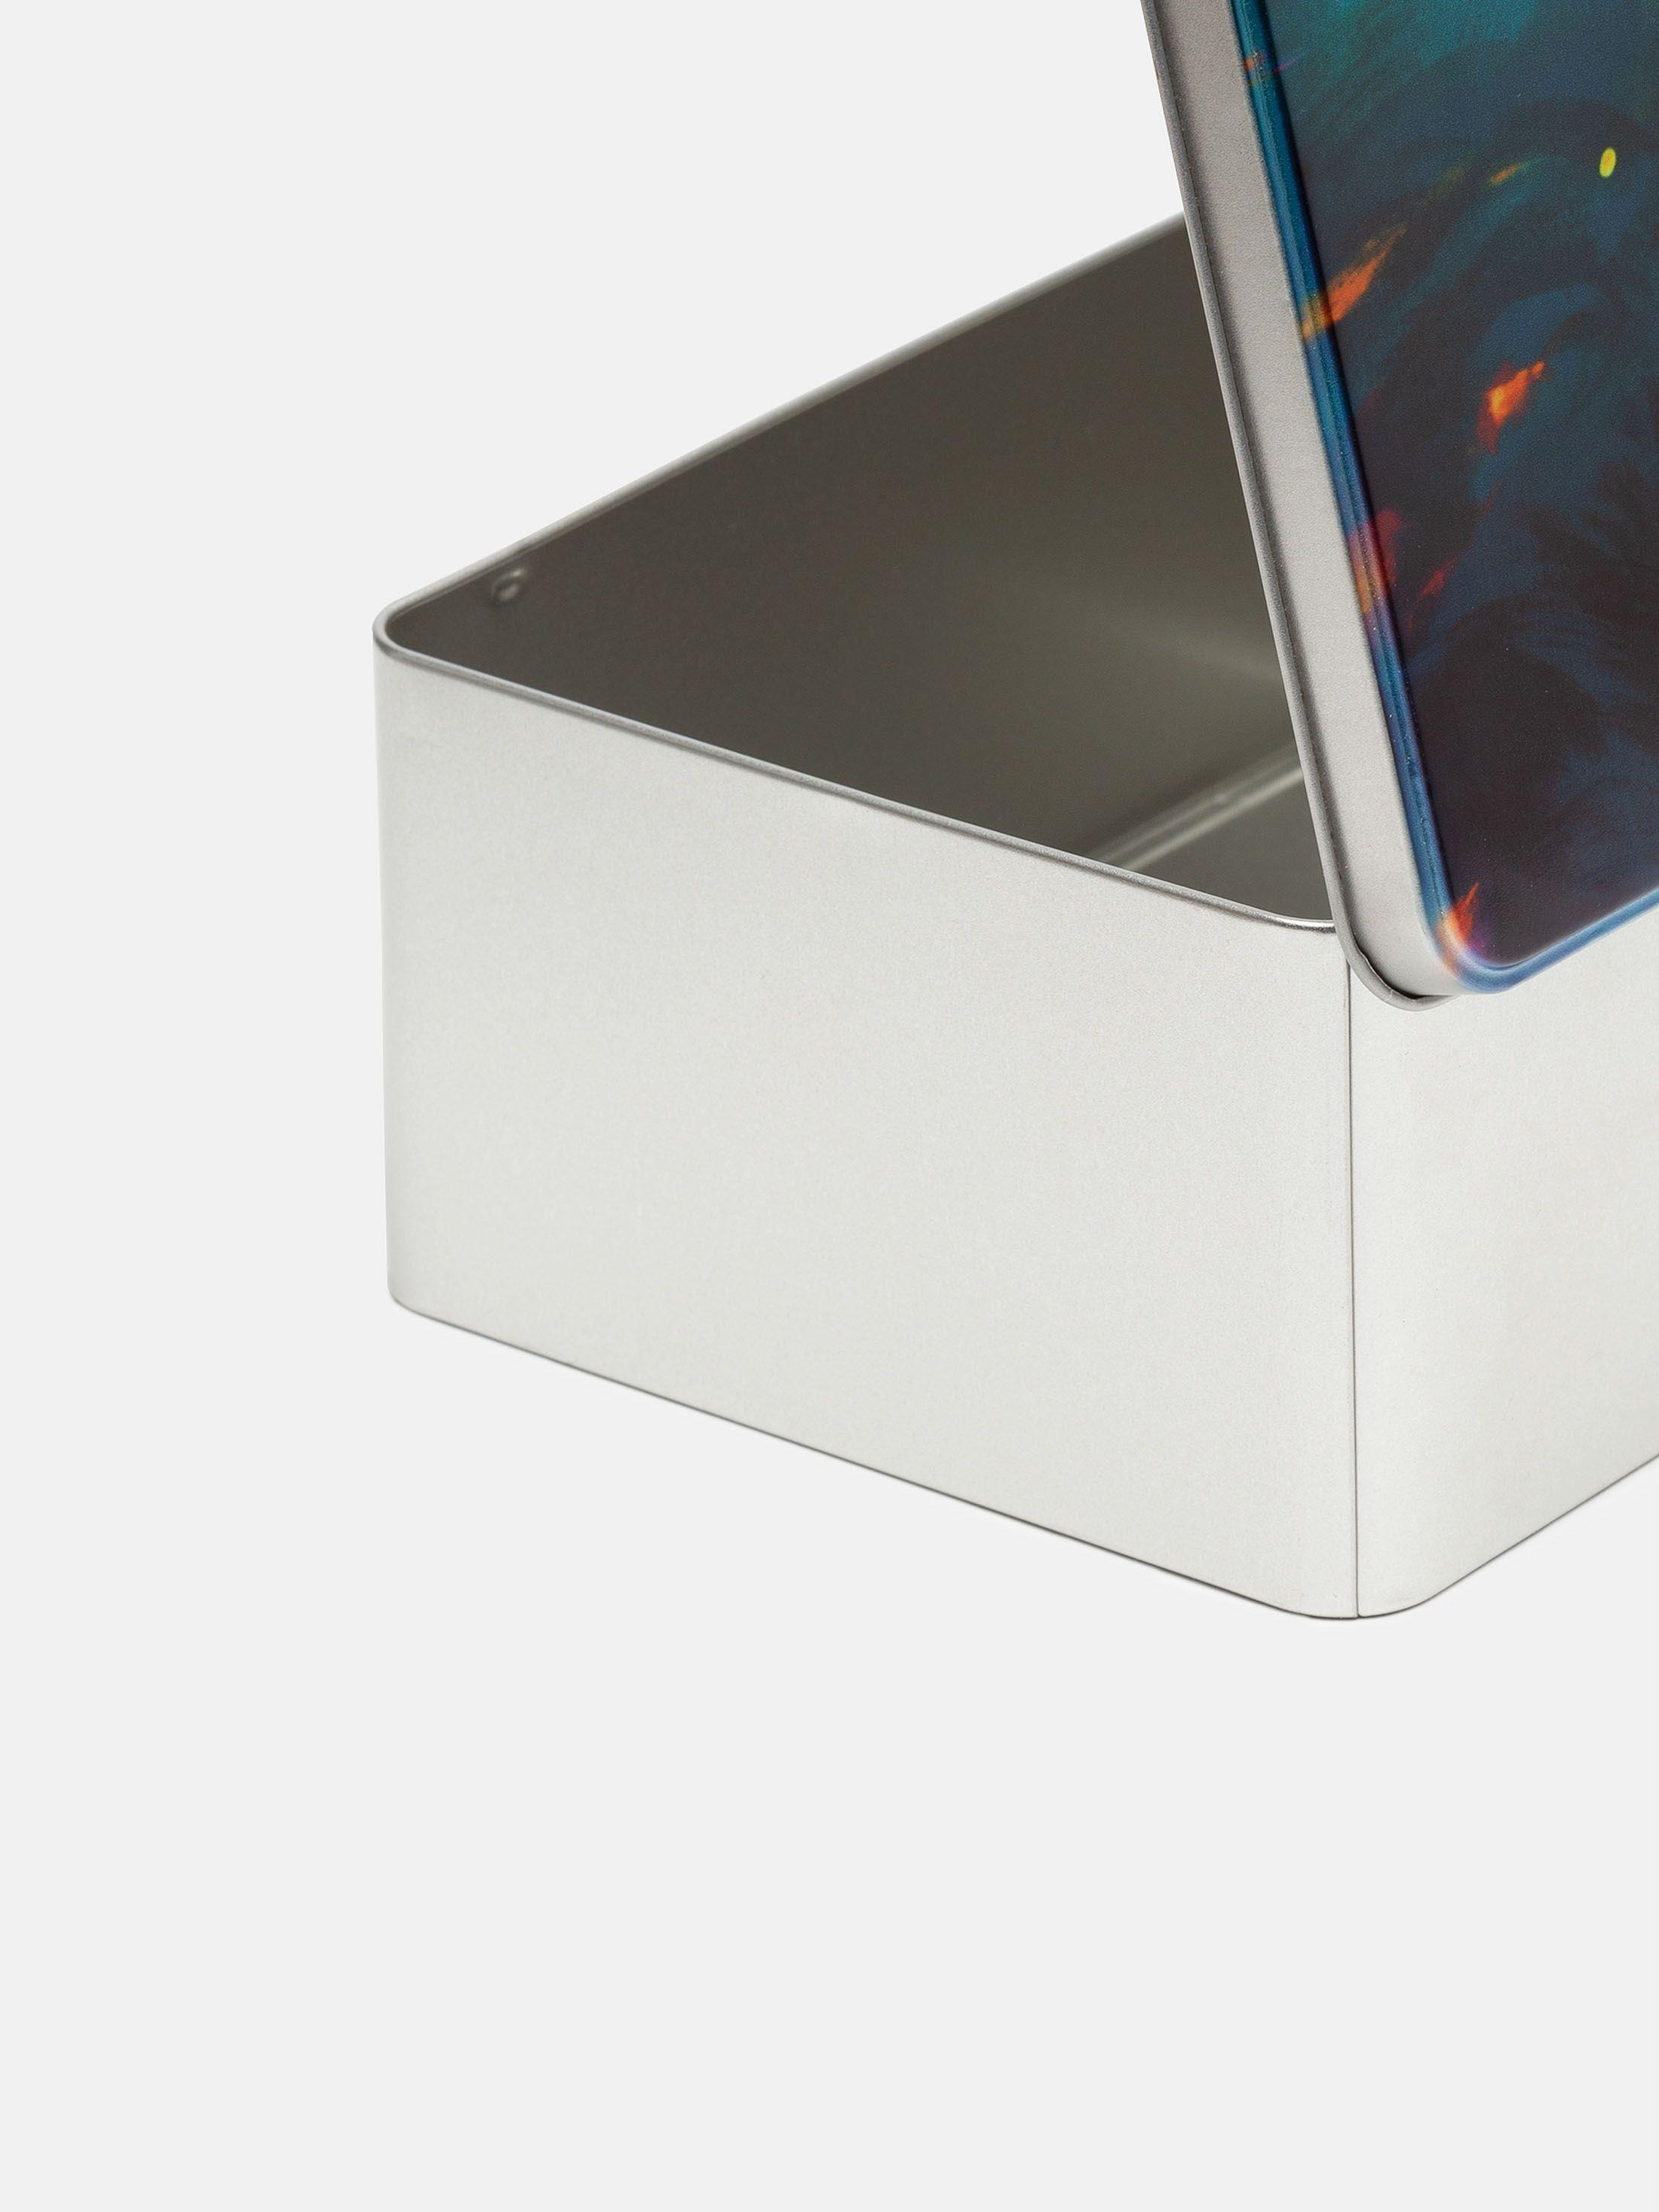 Metal Tins for Sewing Kits